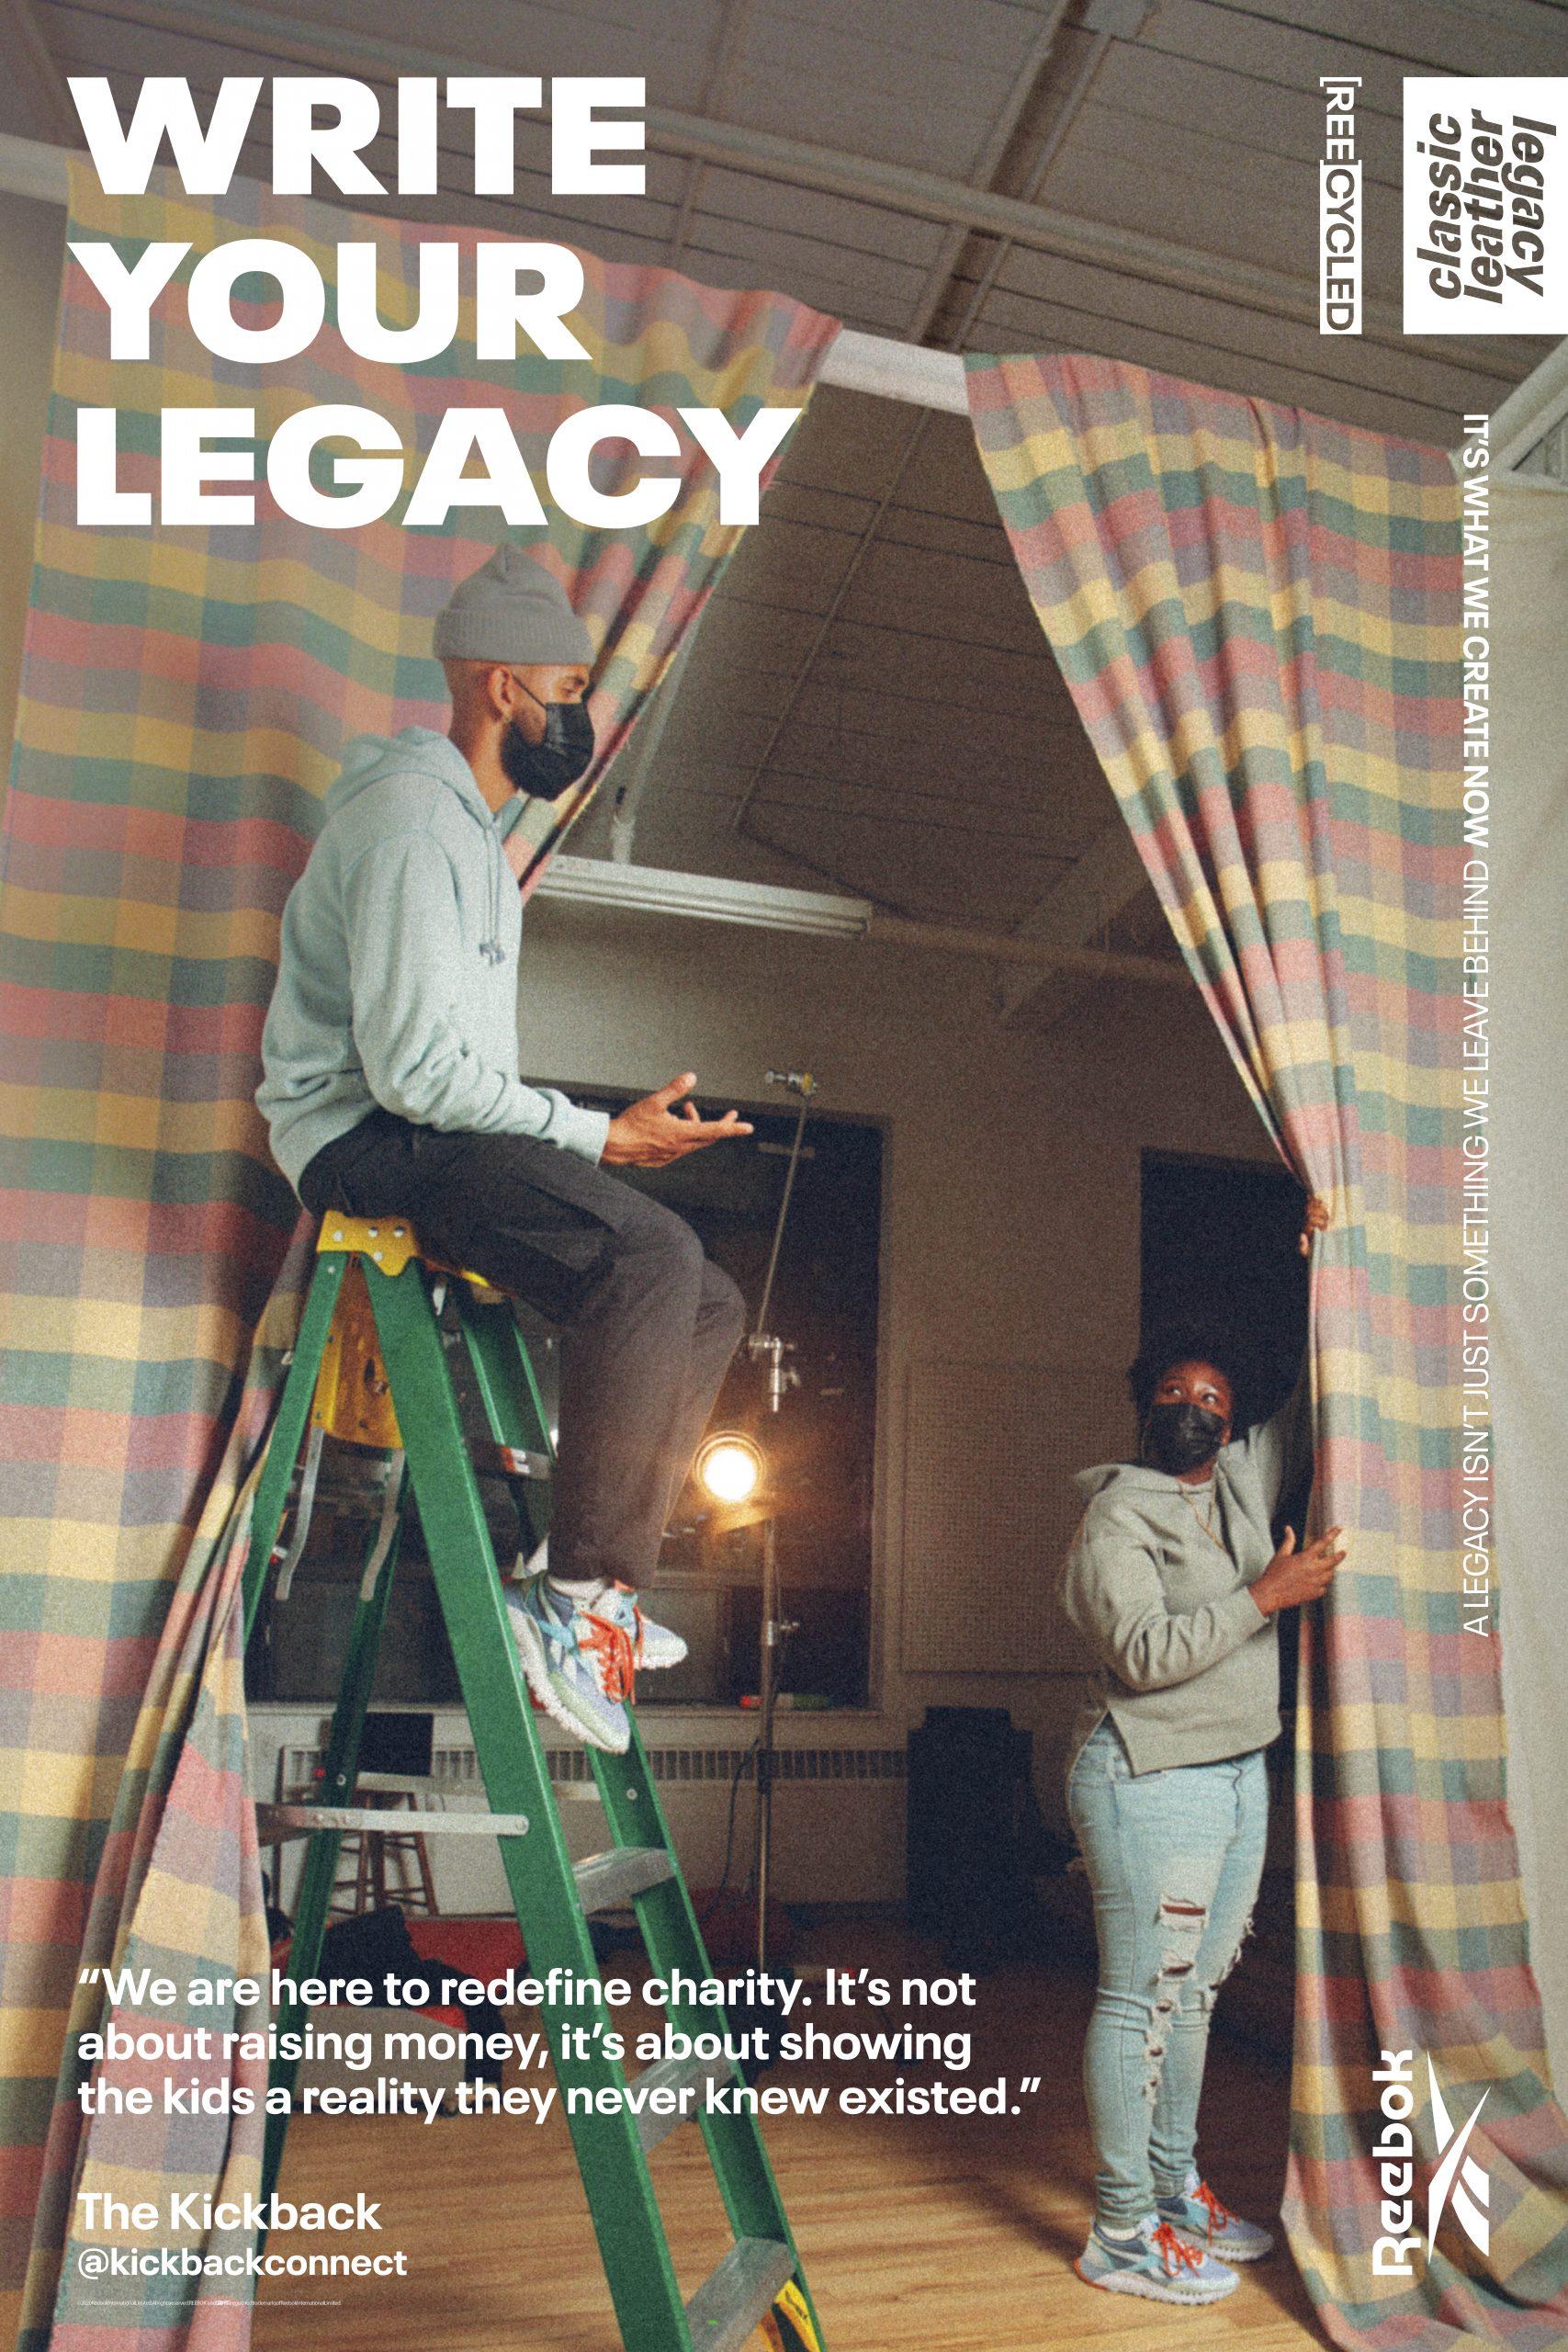 +C22773-C22773_SS21_Classic_Leather_Legacy_GP_The_Kickback_FZ0812_012-673233